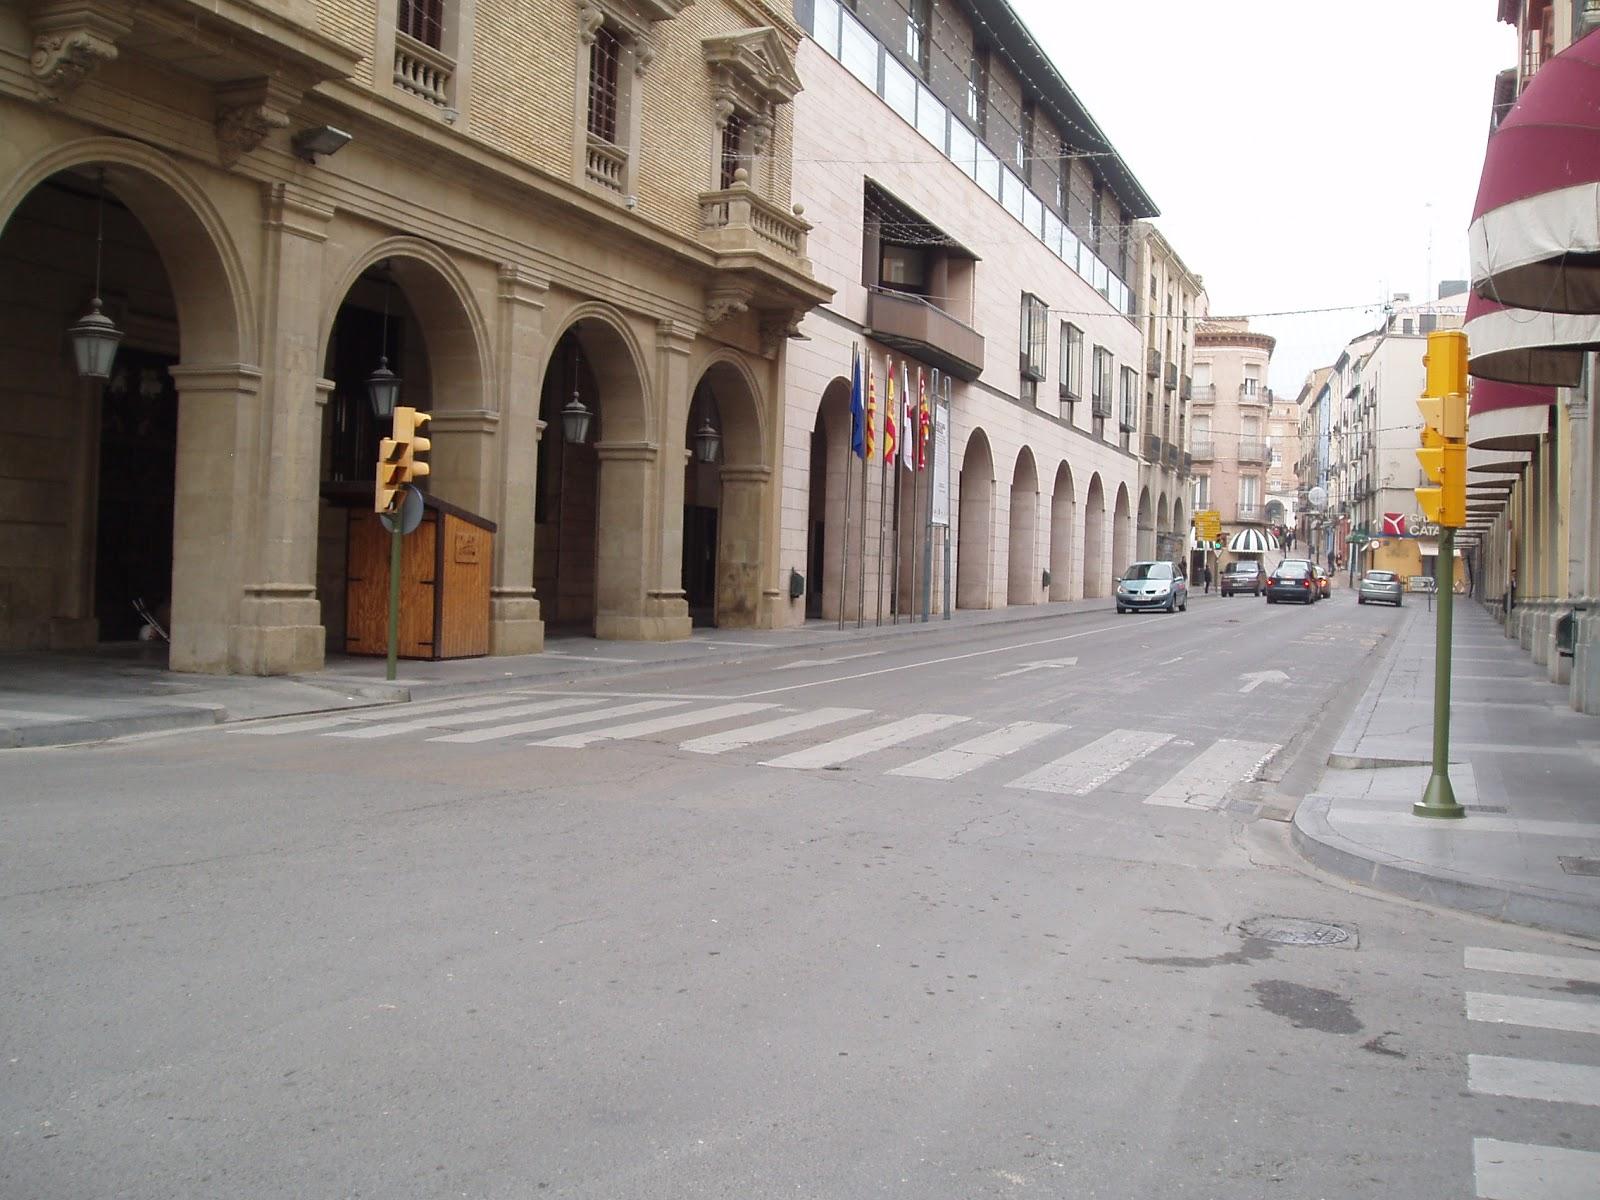 Улица Косо-Бахо в Уэске